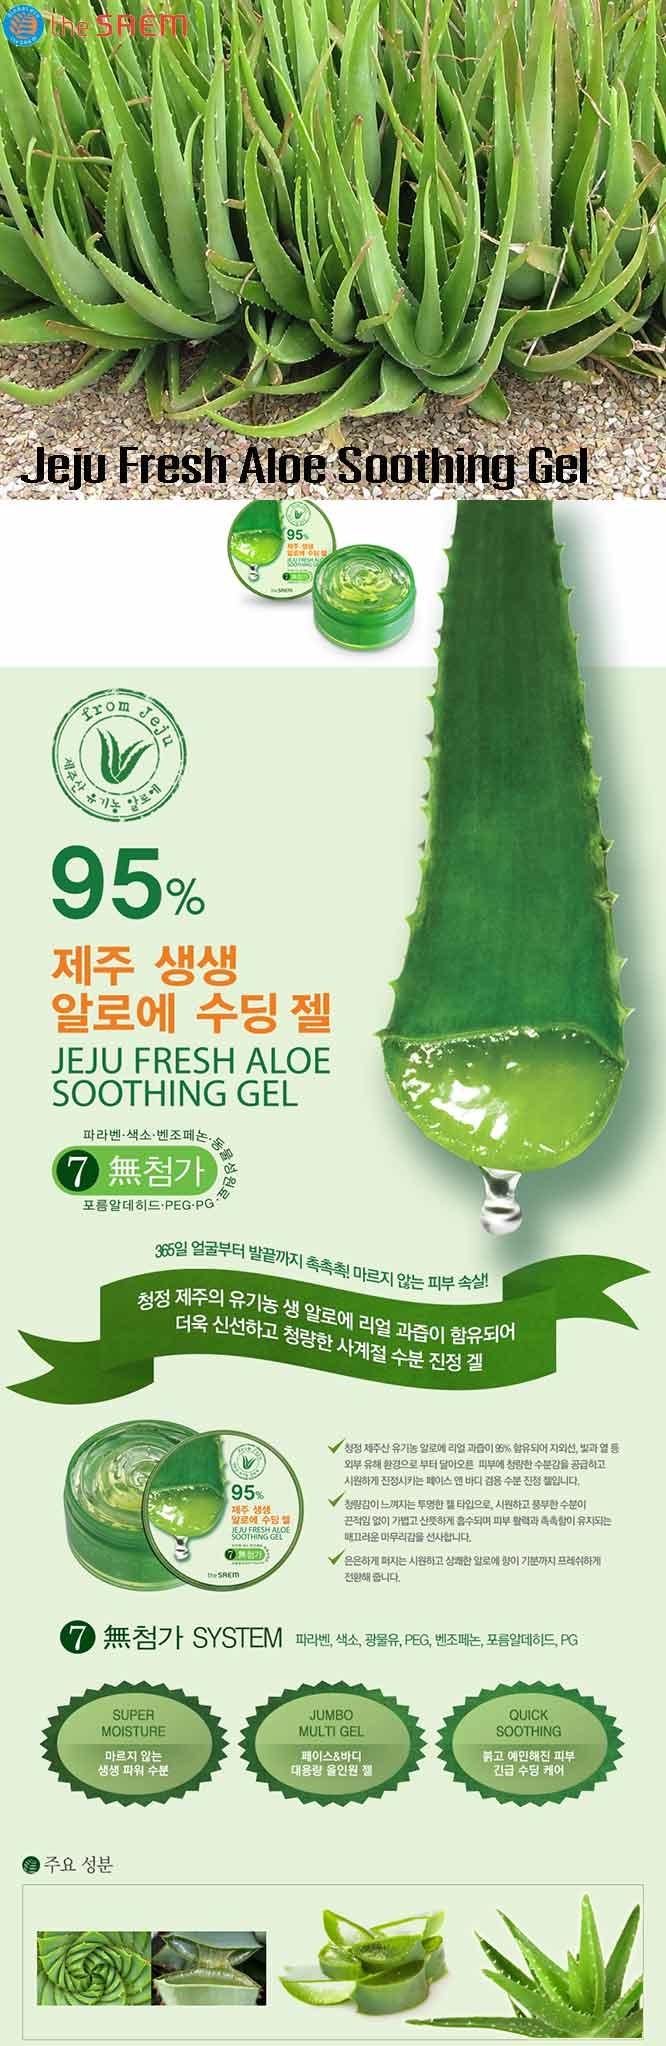 Set The Saem Jeju Fresh Aloe Soothing Gel (120ml x 4)_2